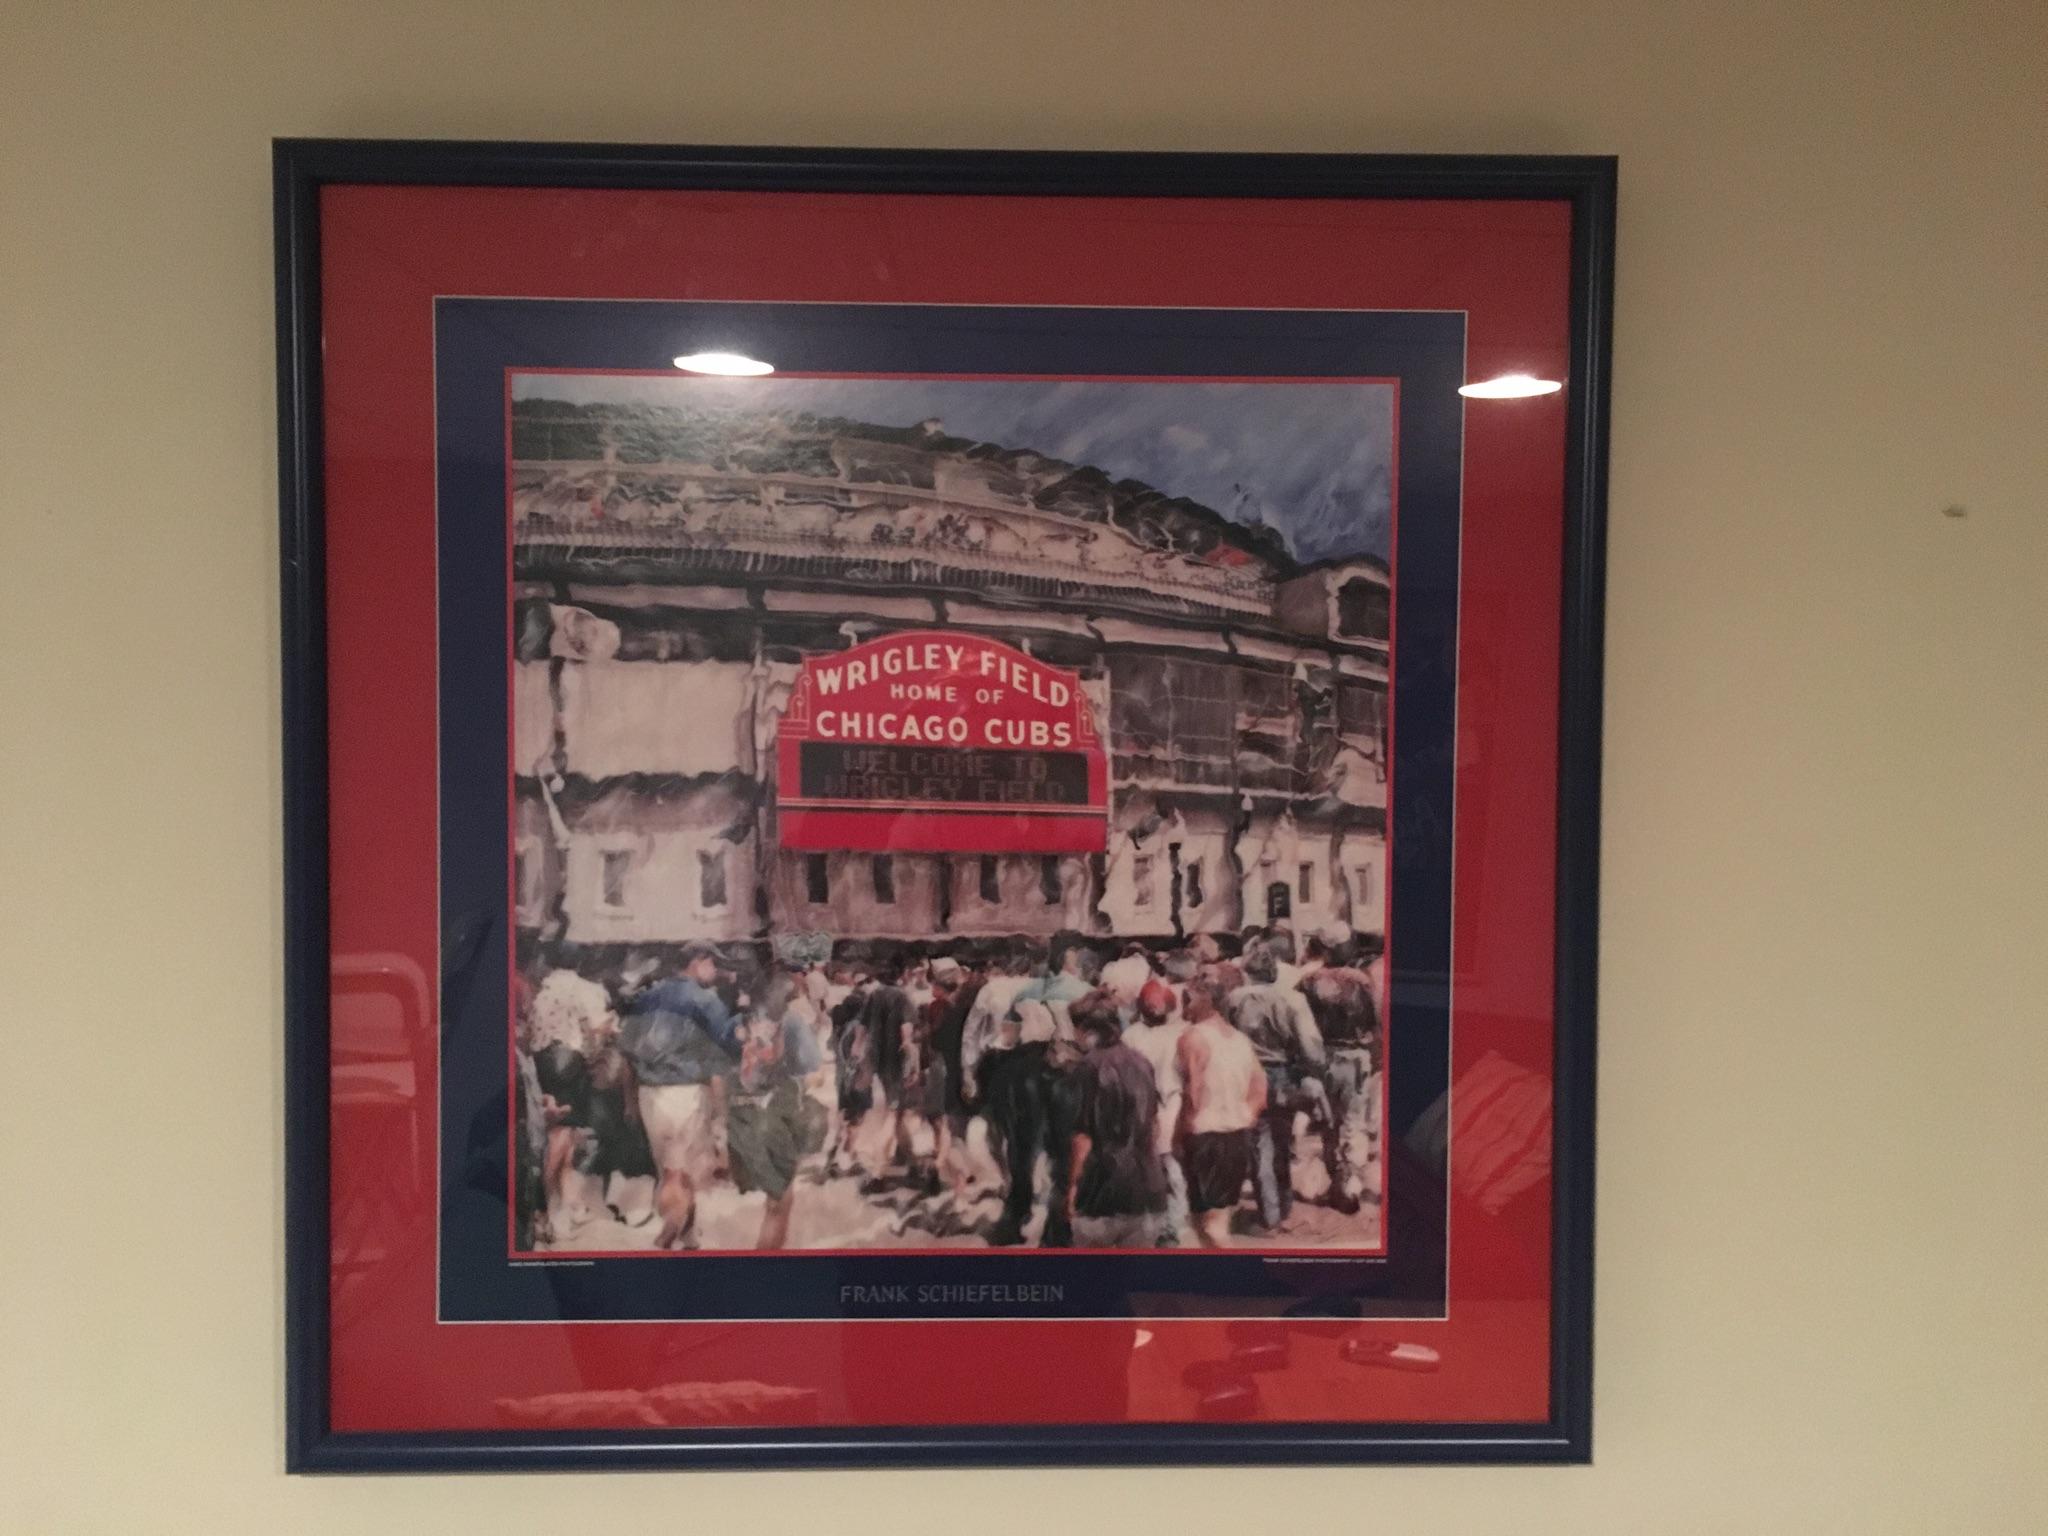 Customer custom framed Chicago Cubs Wrigley Field poster 7